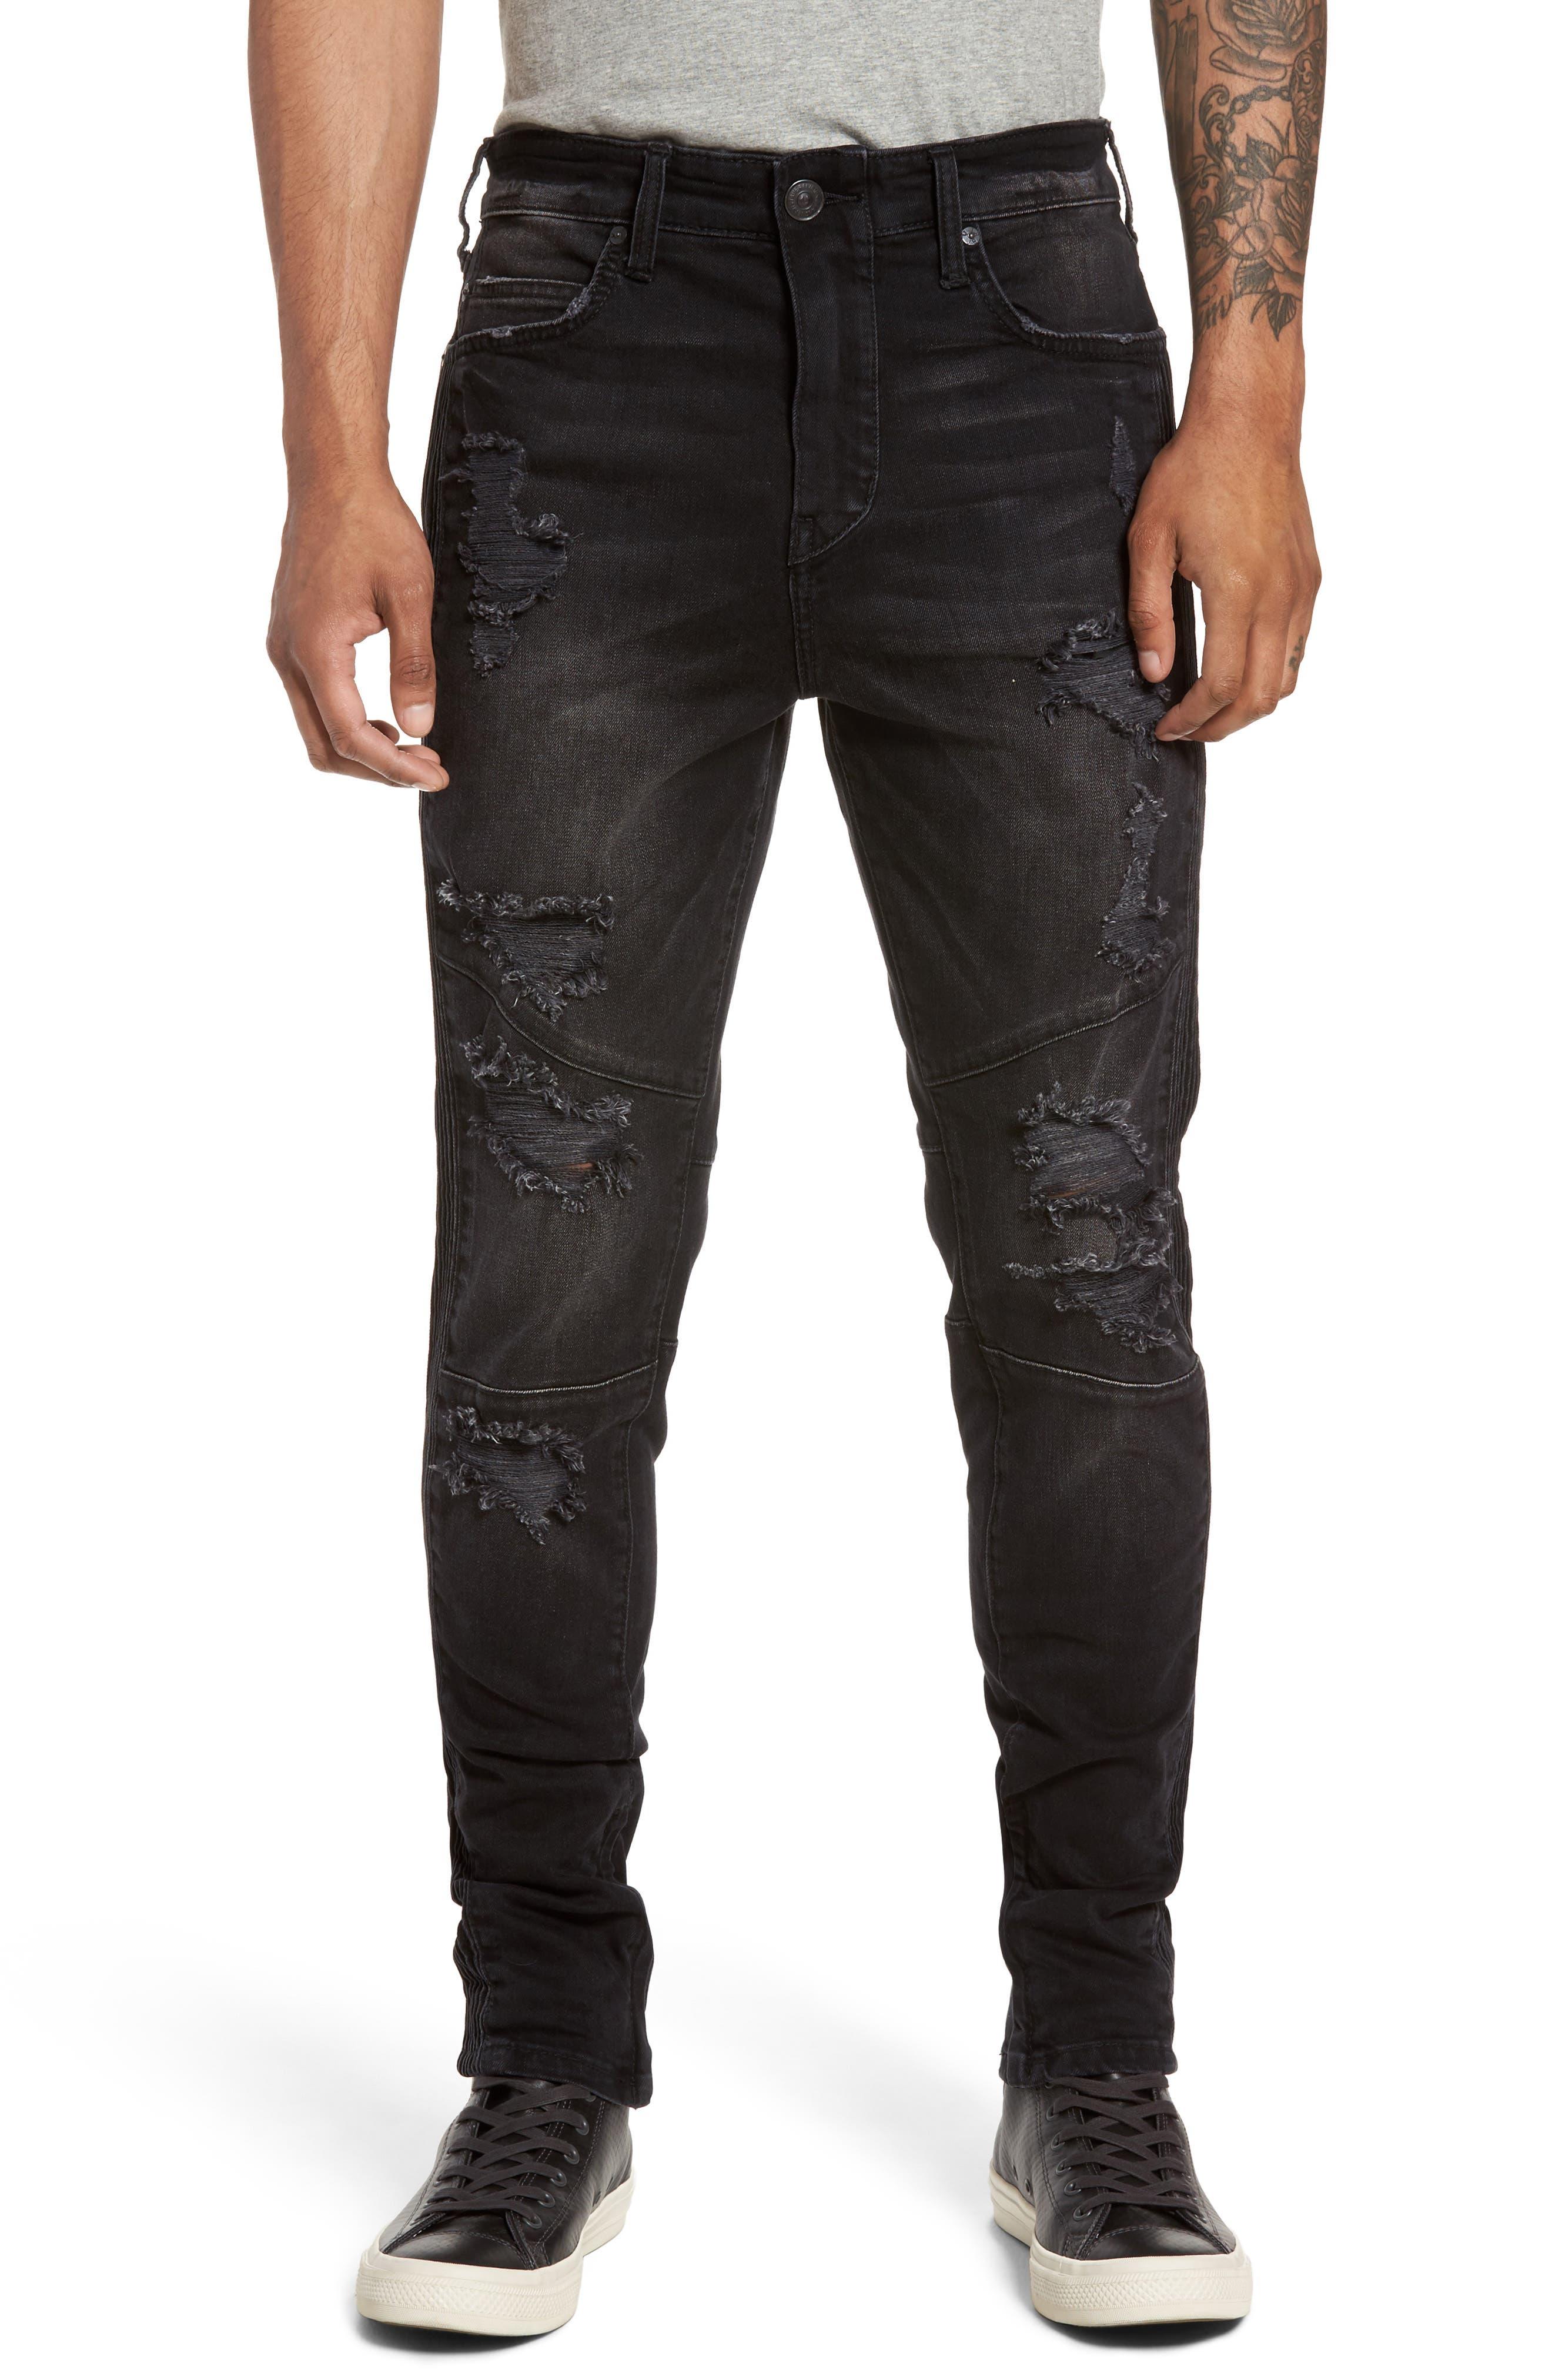 True Religion Brand Jeans Racer Skinny Fit Moto Jeans (Worn Nights)